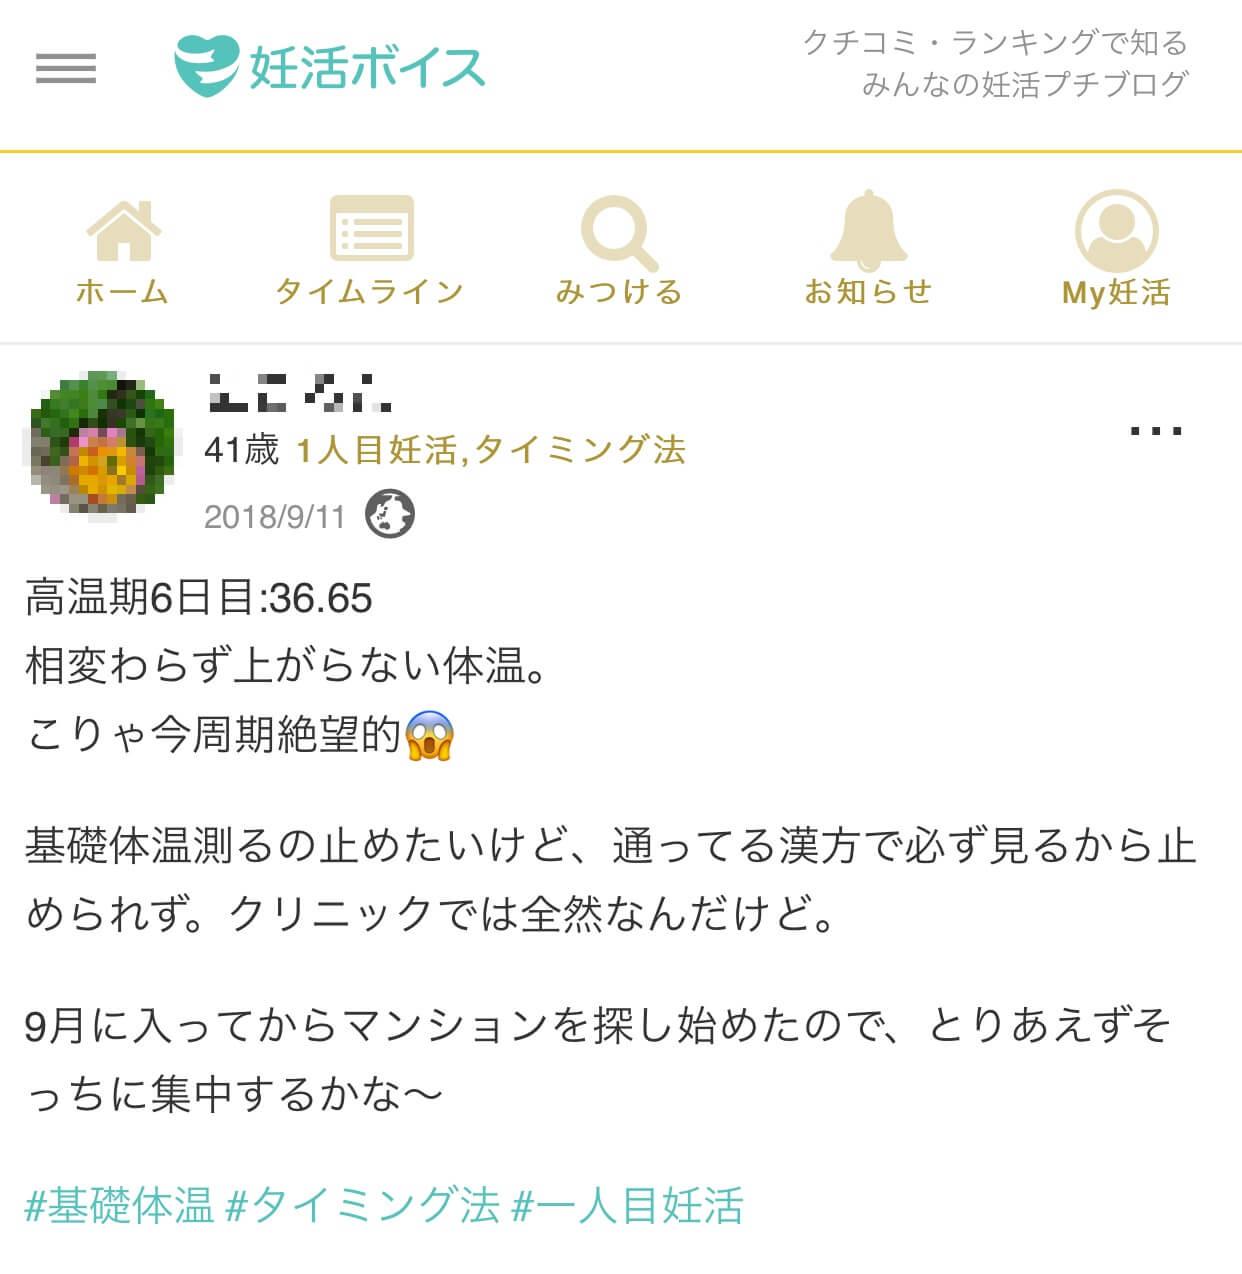 Nさん(41歳・1人目妊活・タイミング法)